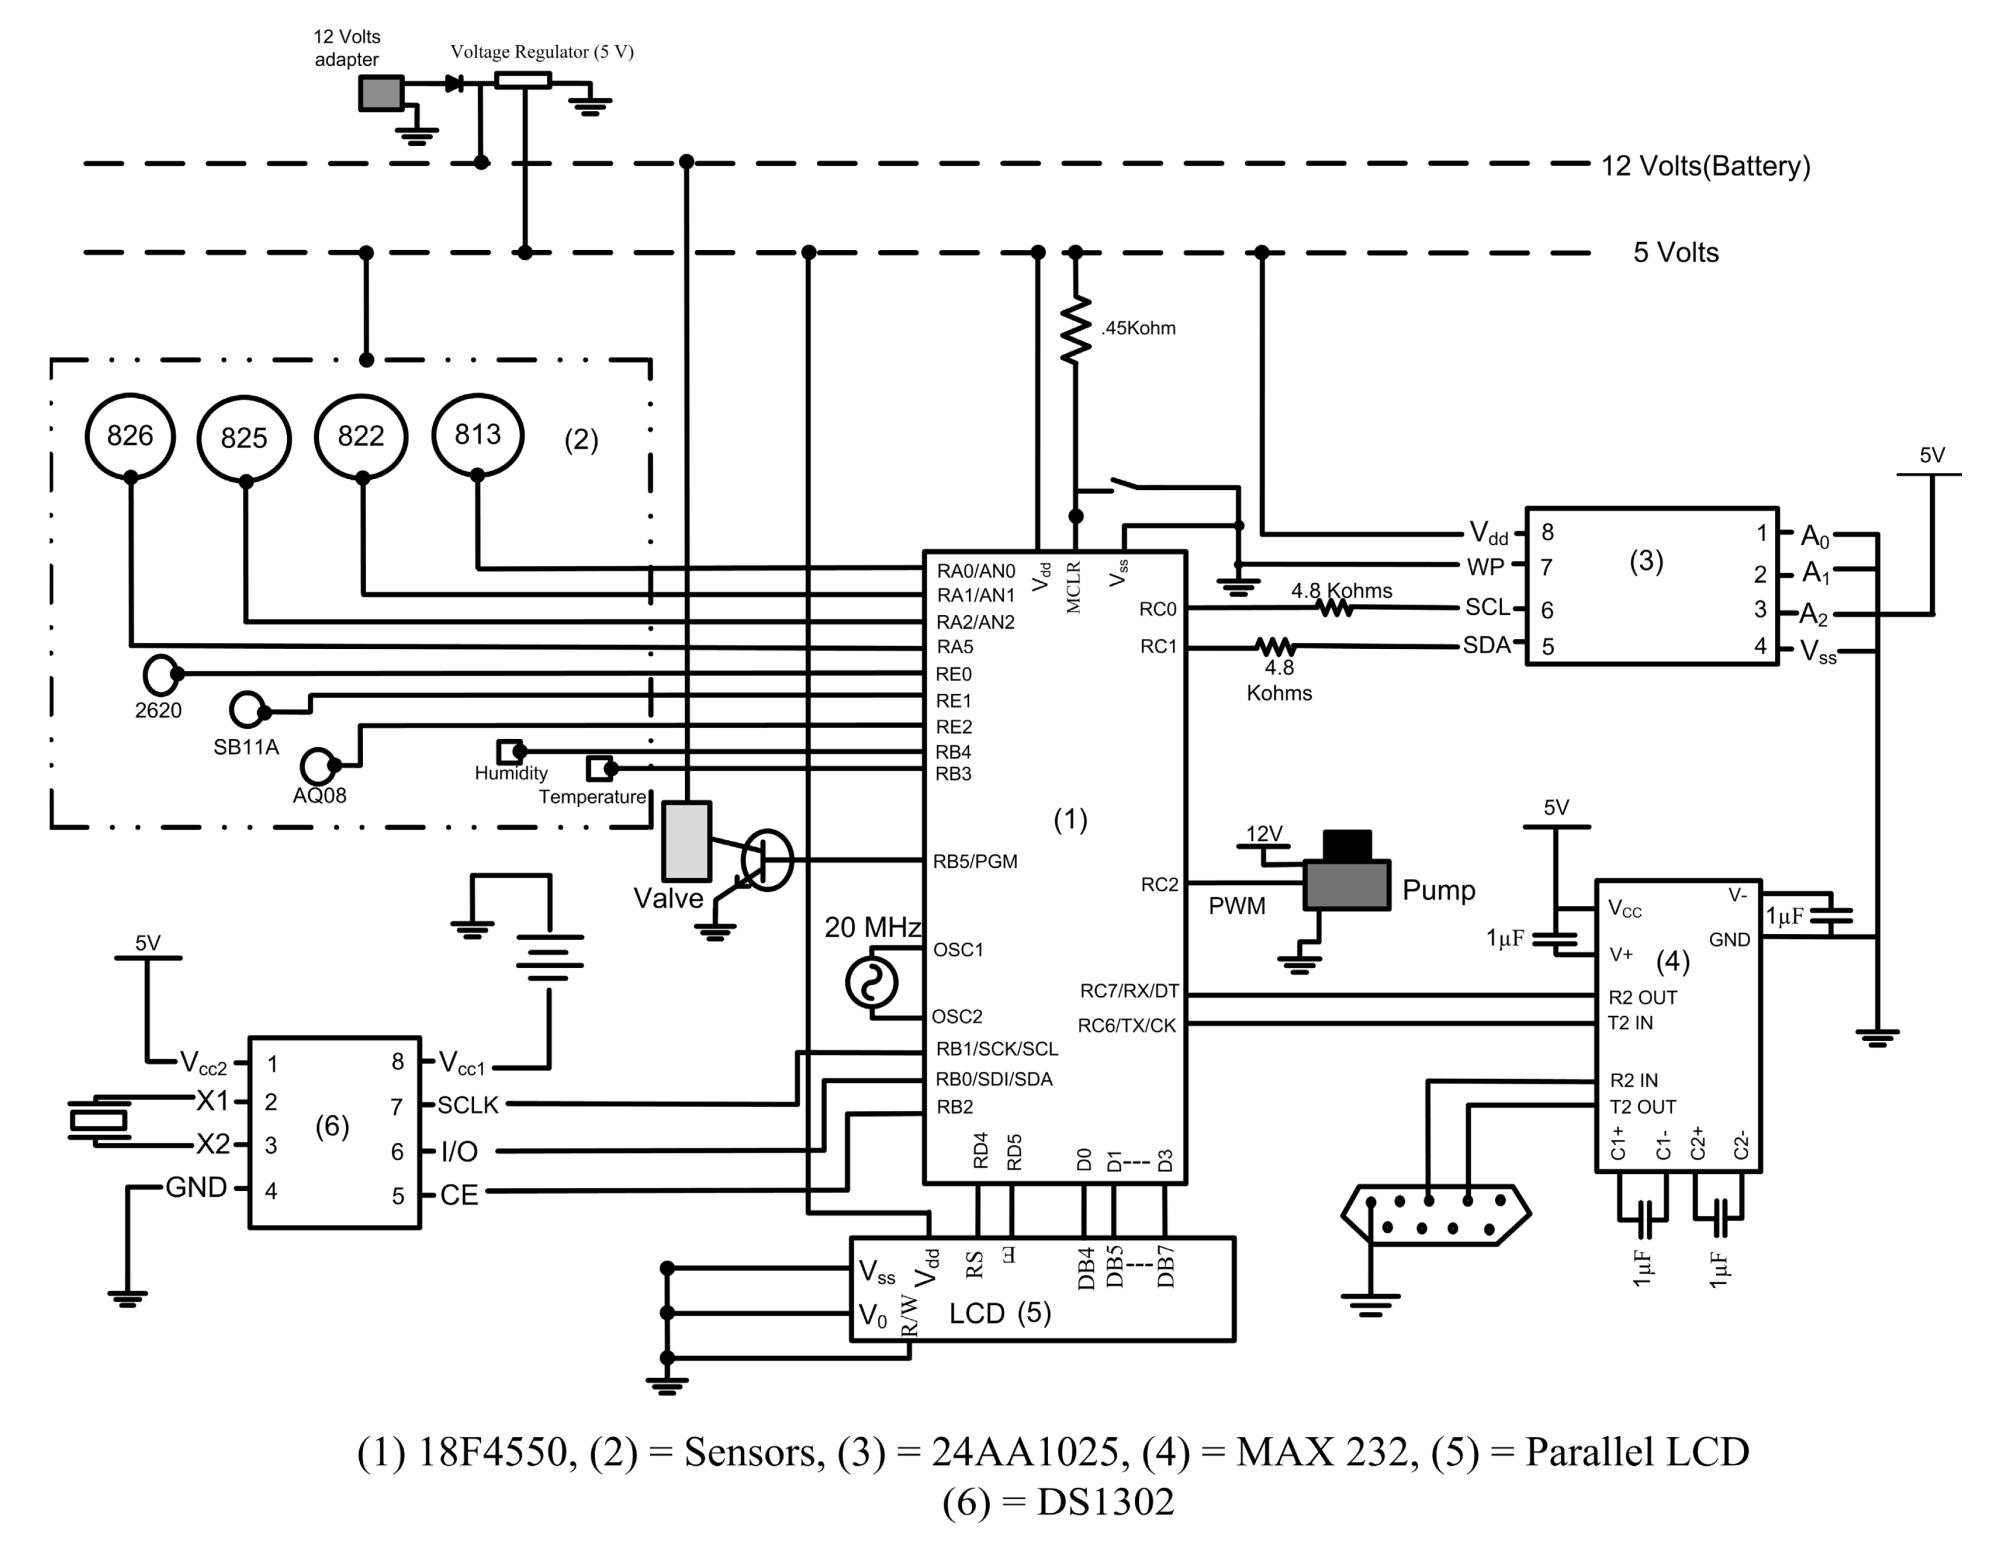 hight resolution of sensors 15 01252f4 1024